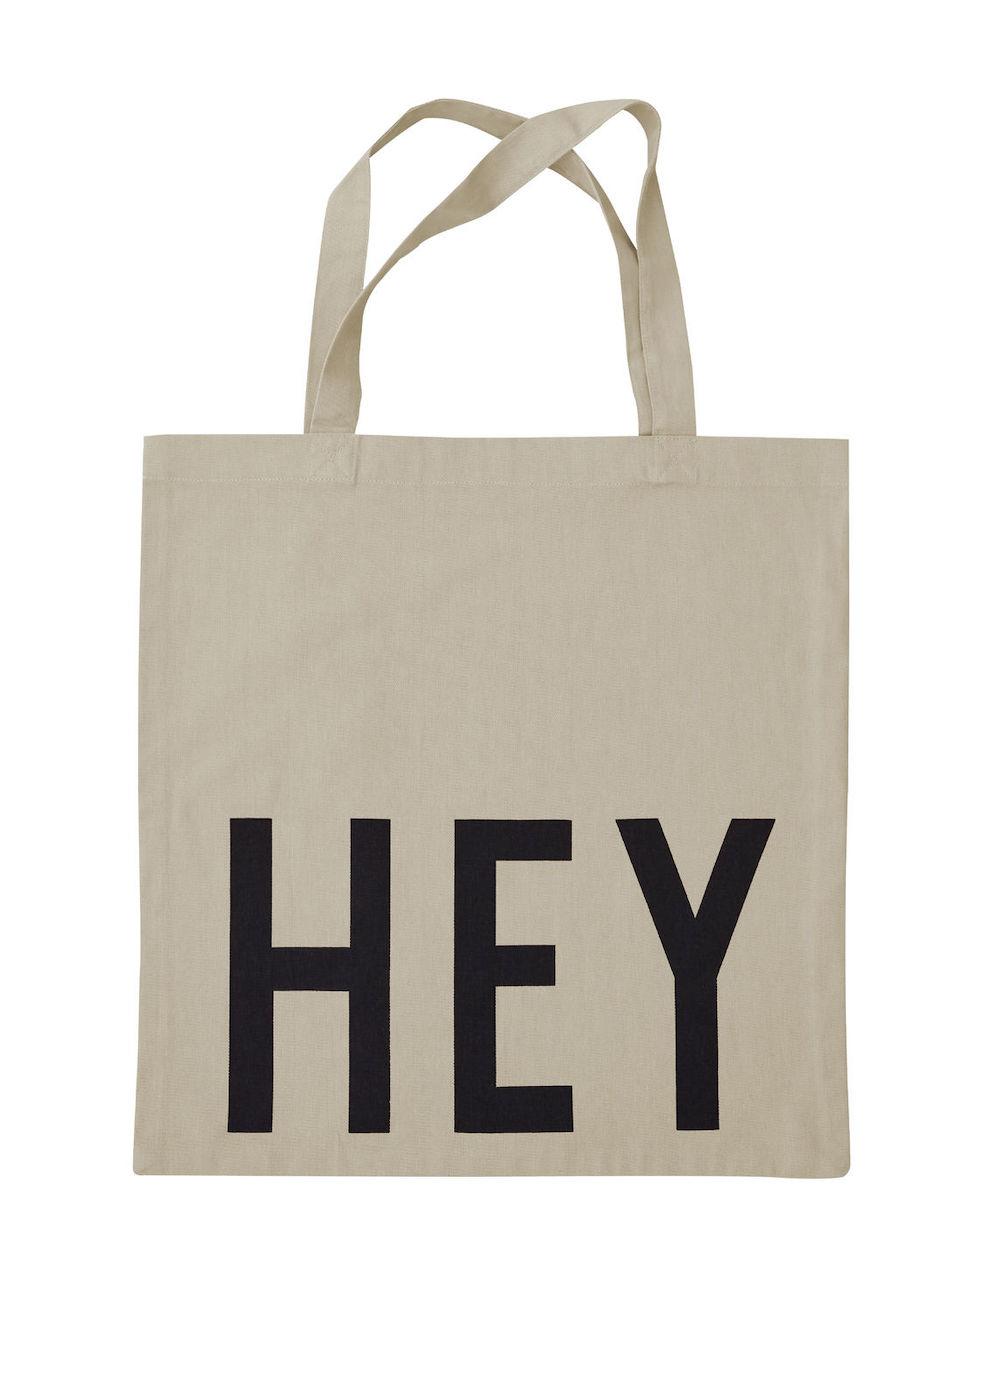 Hygge Tasche, Hygge Becher, Arne Jacobsen, Design Letters , Neuheiten 2020, Dänemark